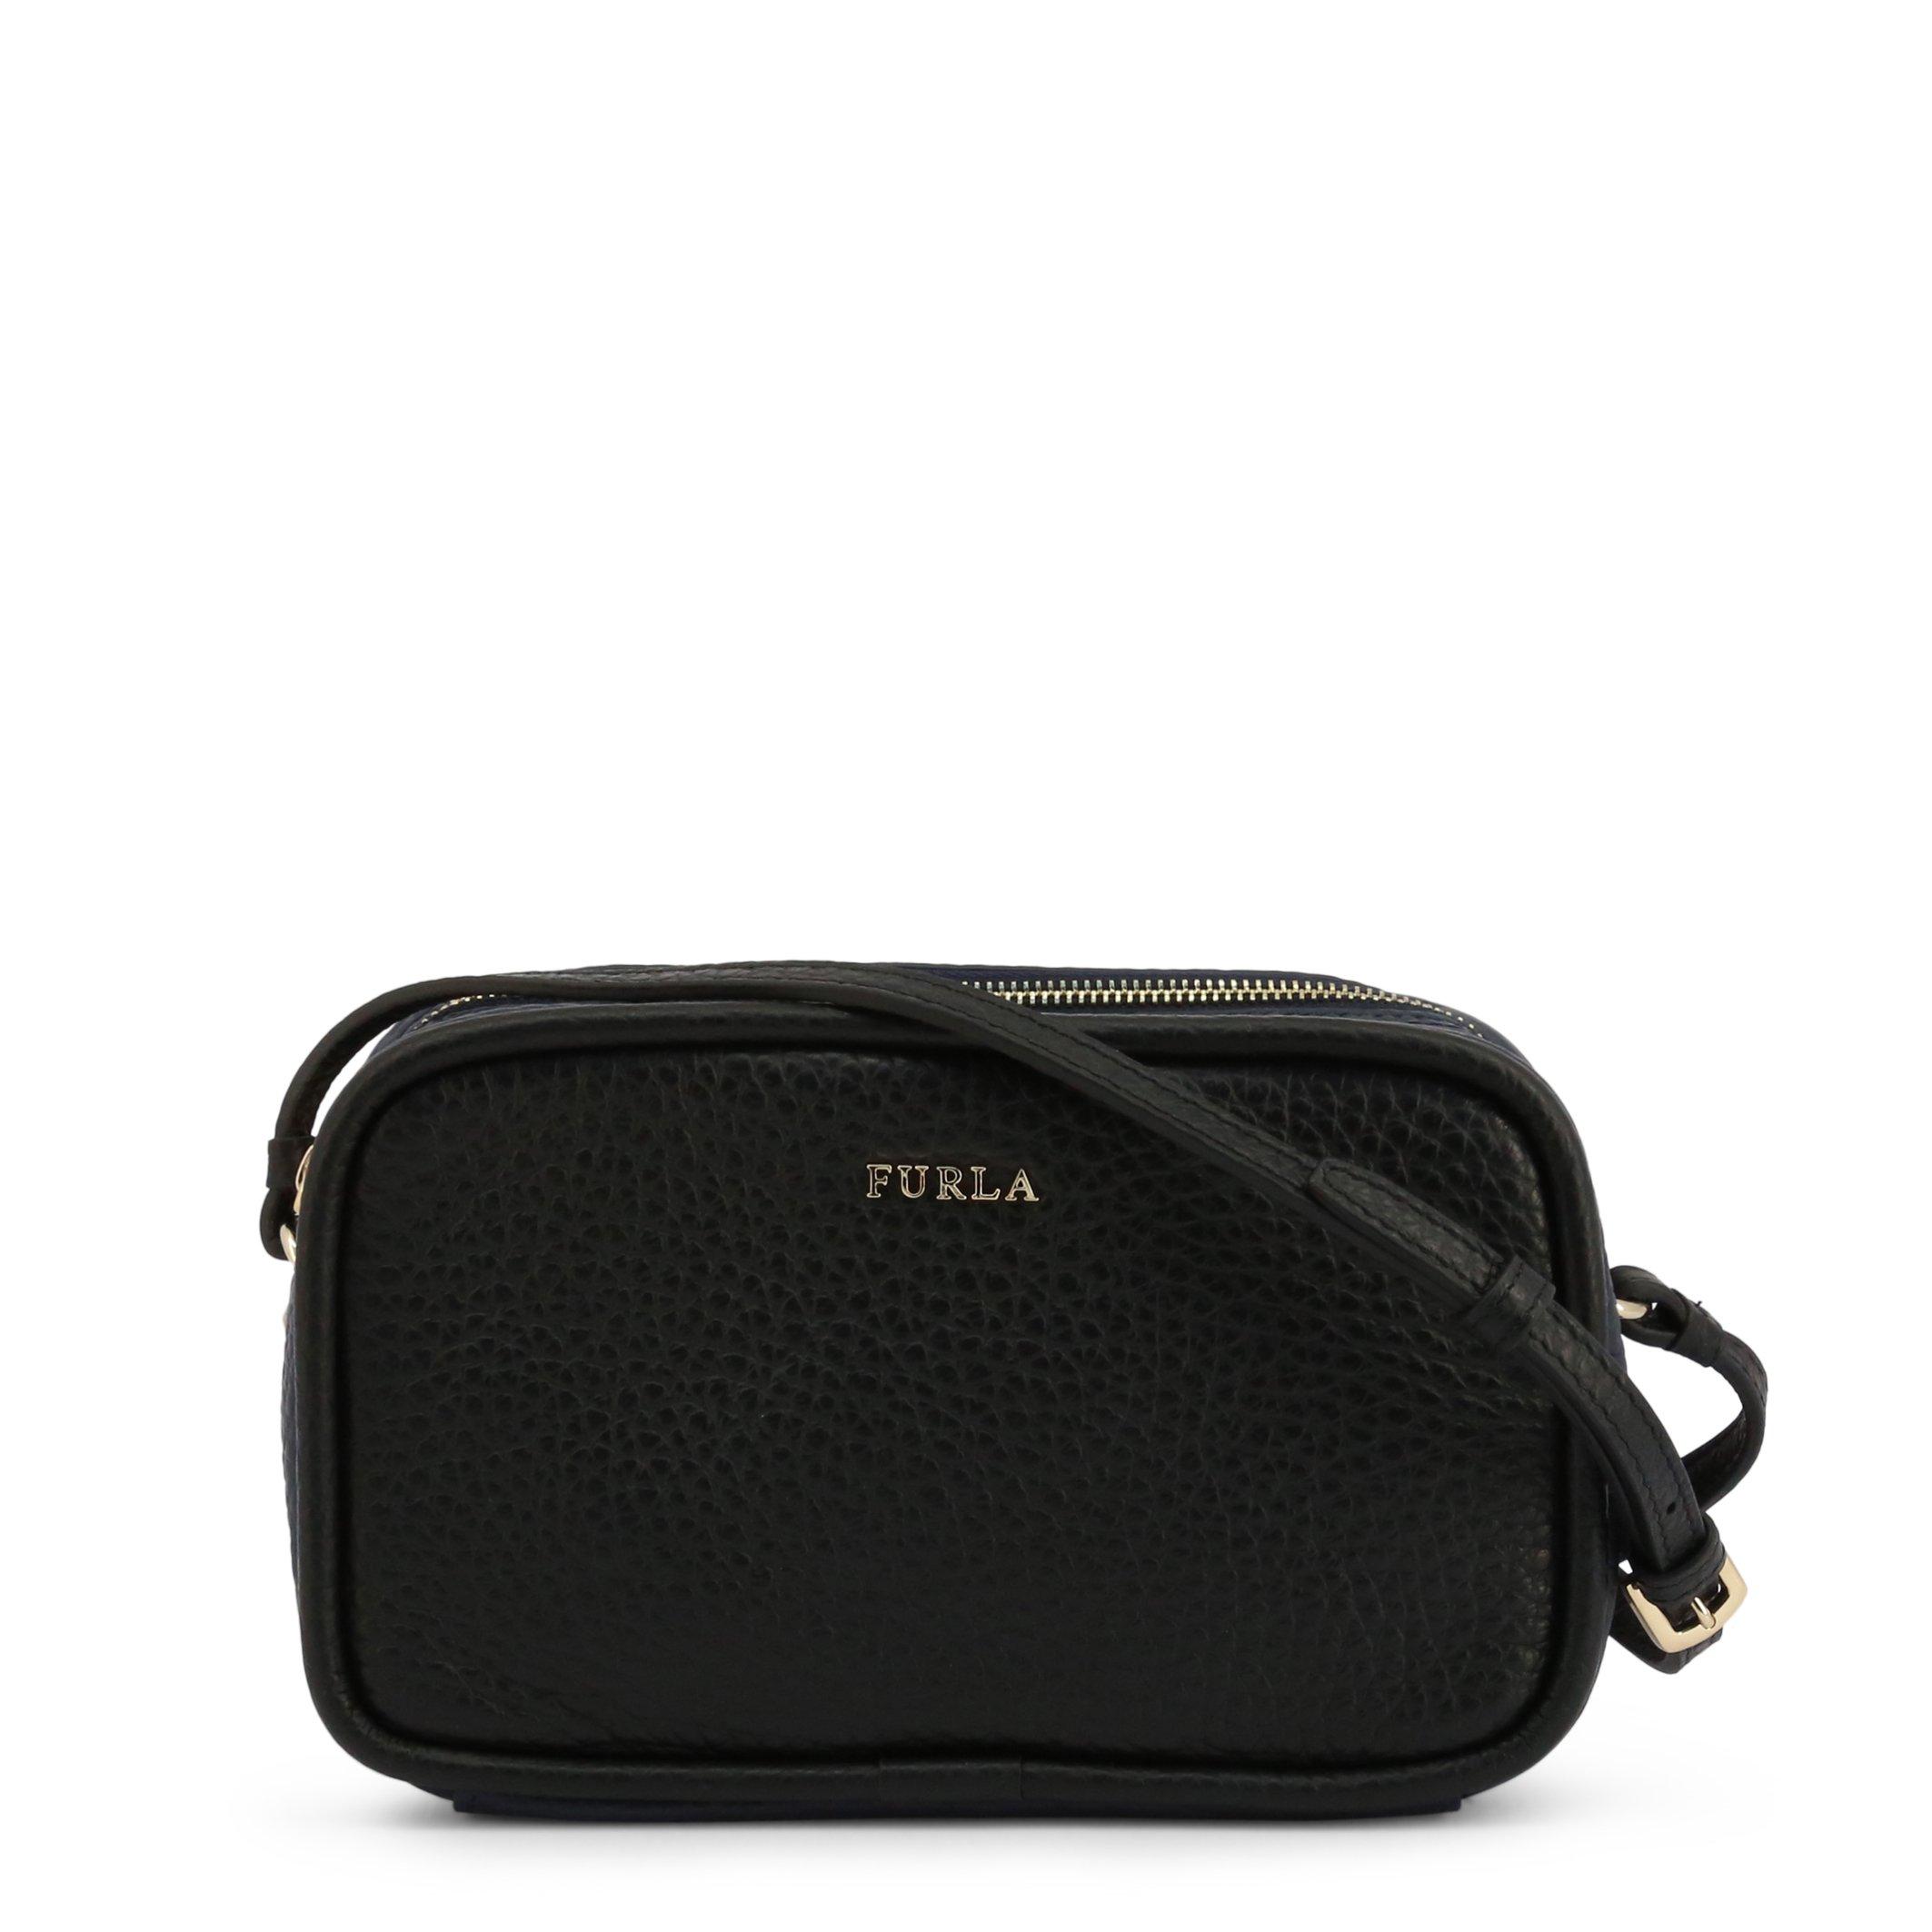 Furla Women's Crossbody Bag Various Colours LILLI_EAX8 - black NOSIZE